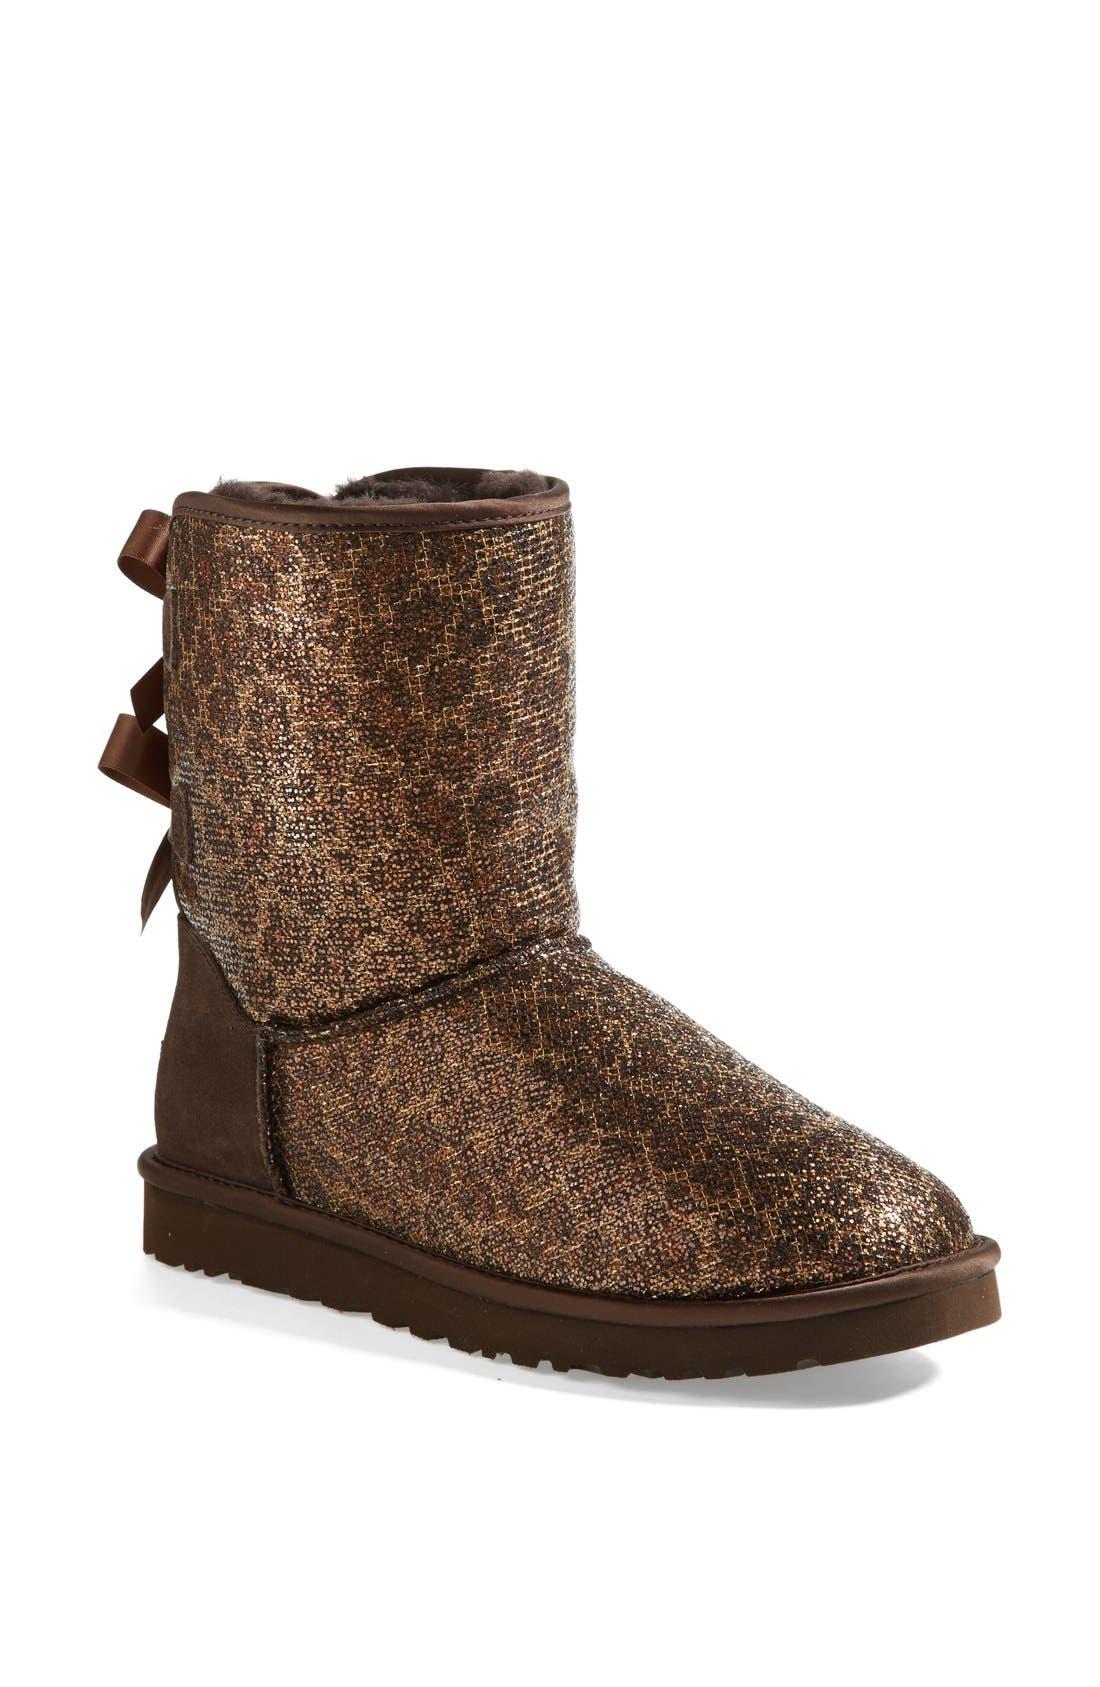 Alternate Image 1 Selected - UGG® Australia 'Bailey Bow Glitter' Boot (Women)